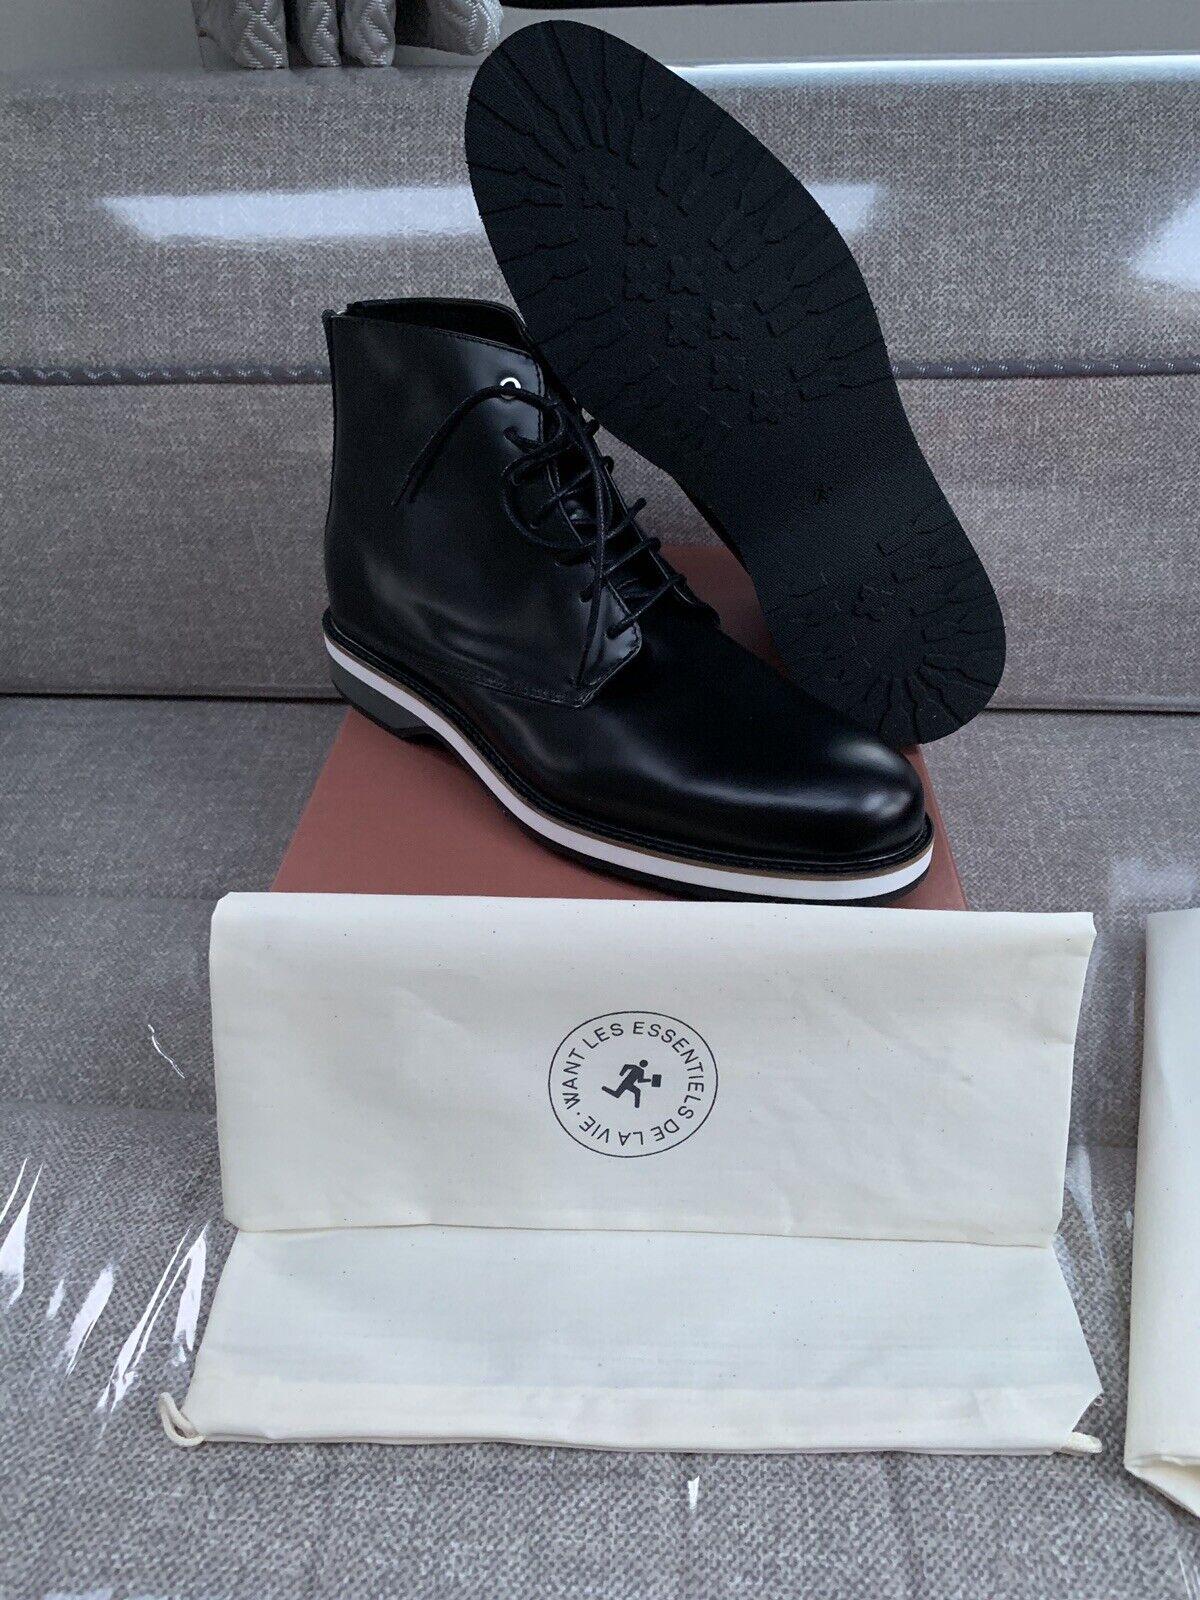 want les essentiels Boots  Montoro High Size 10